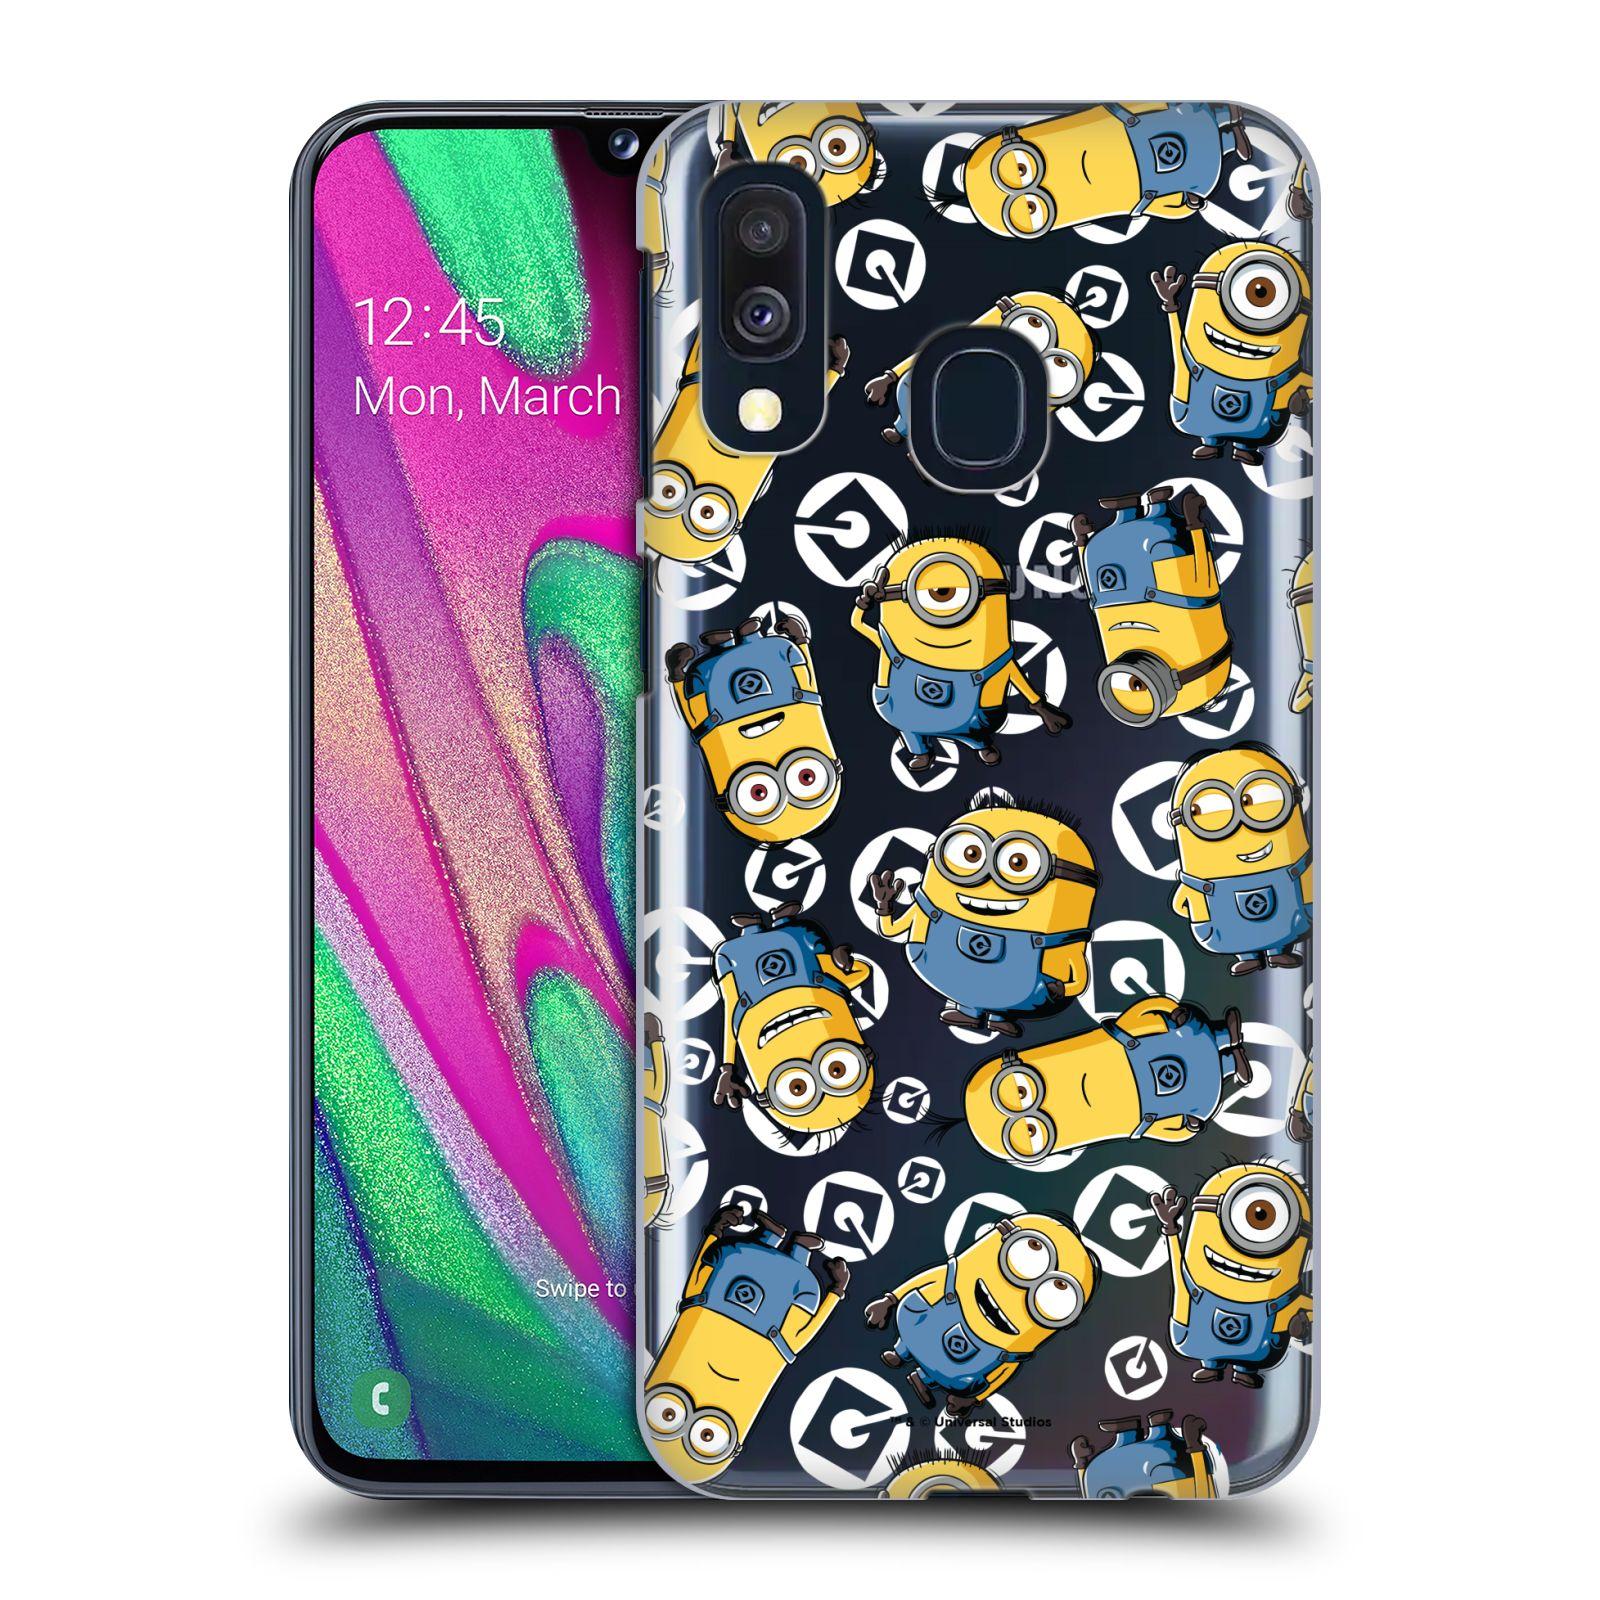 Plastové pouzdro na mobil Samsung Galaxy A40 - Head Case - Minion pattern z filmu Já, padouch - Despicable Me